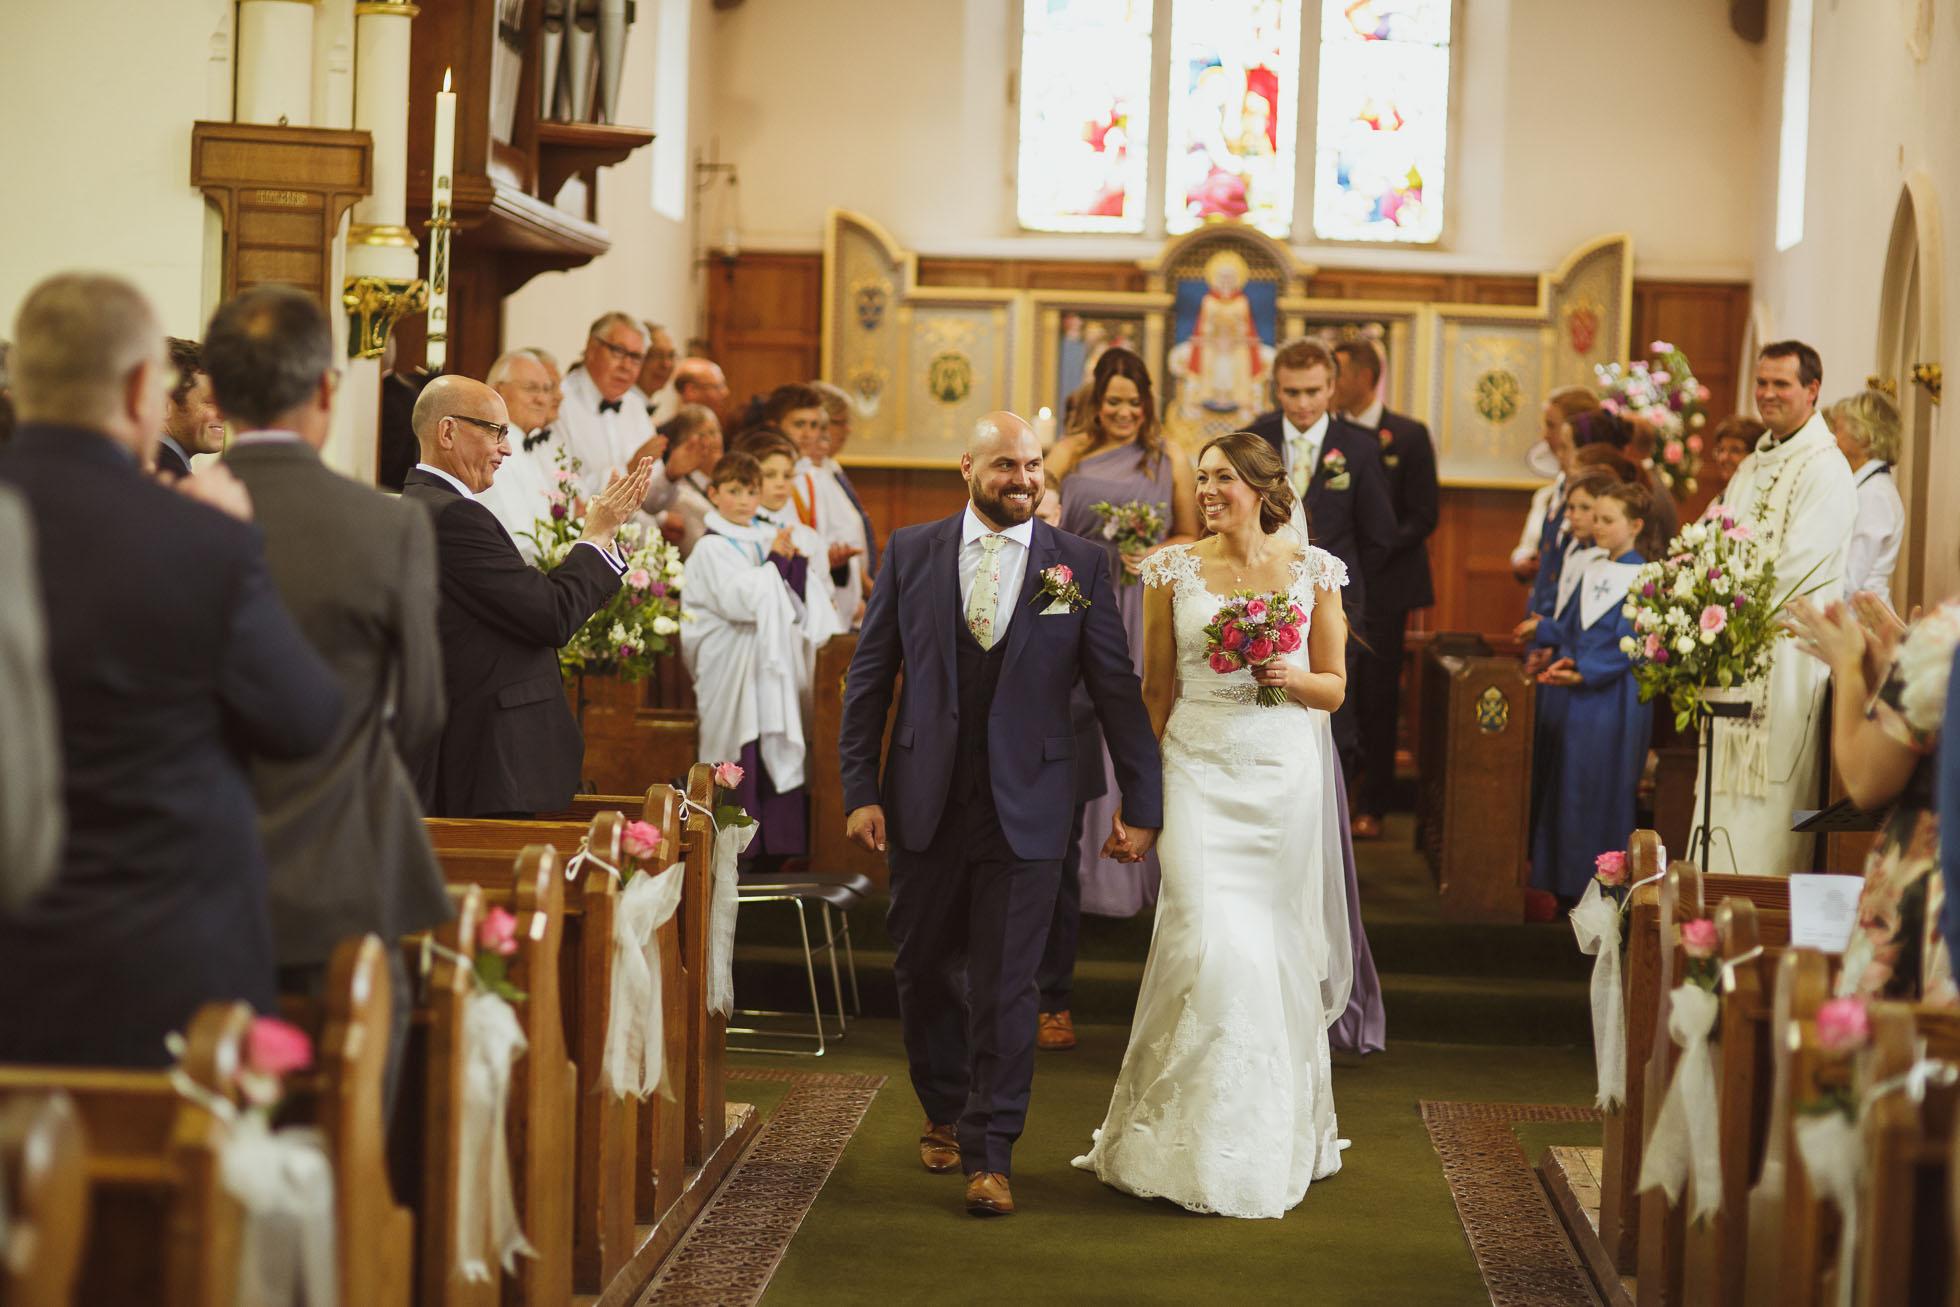 denton-hall-wedding-photographer-32.jpg